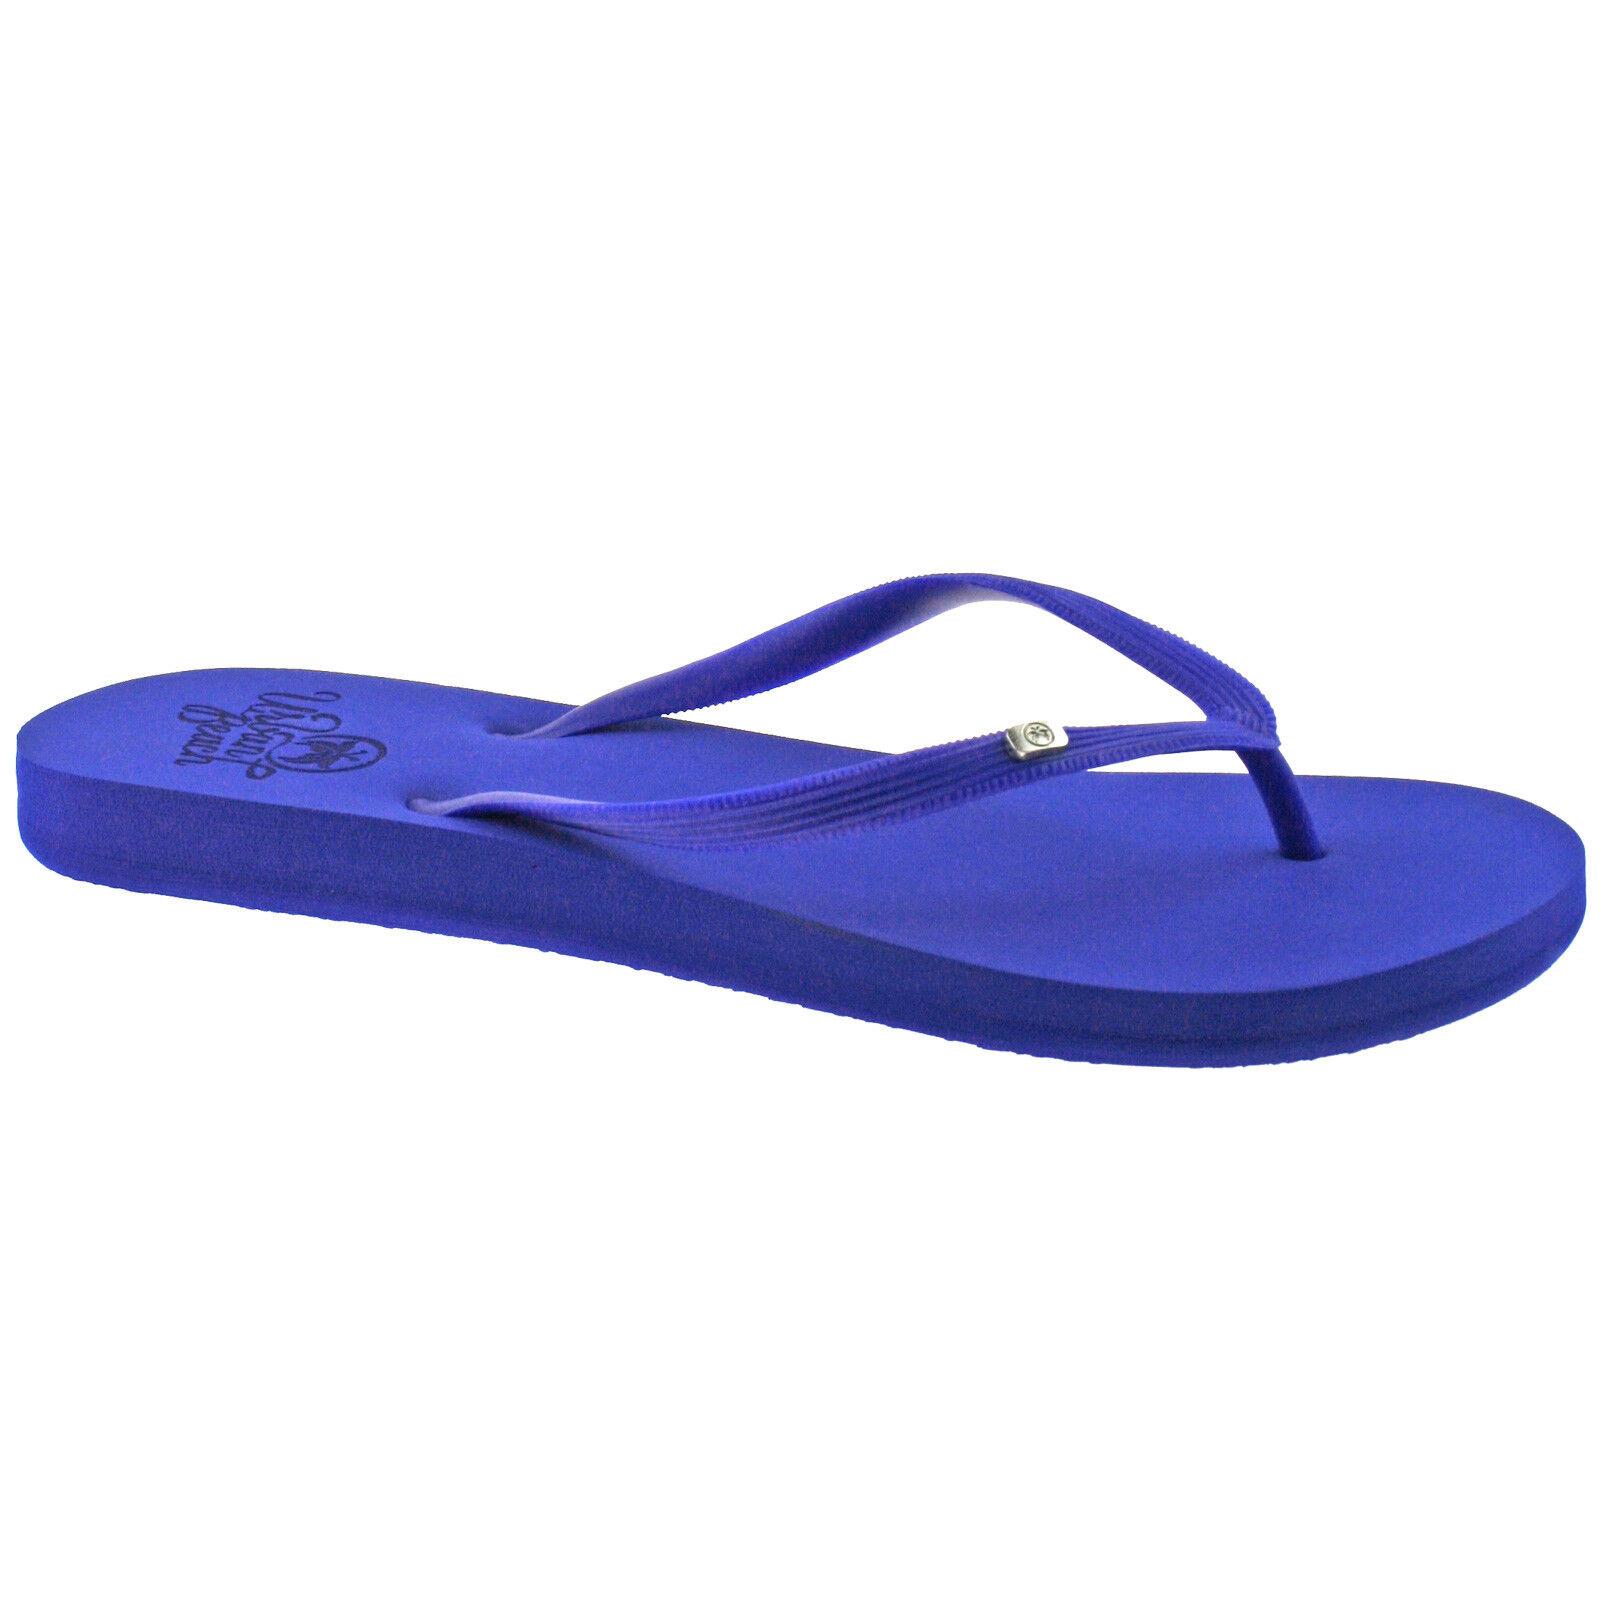 Ladies Urban Beach Wight Blue Toe Post Flip Flops Sandals -2562